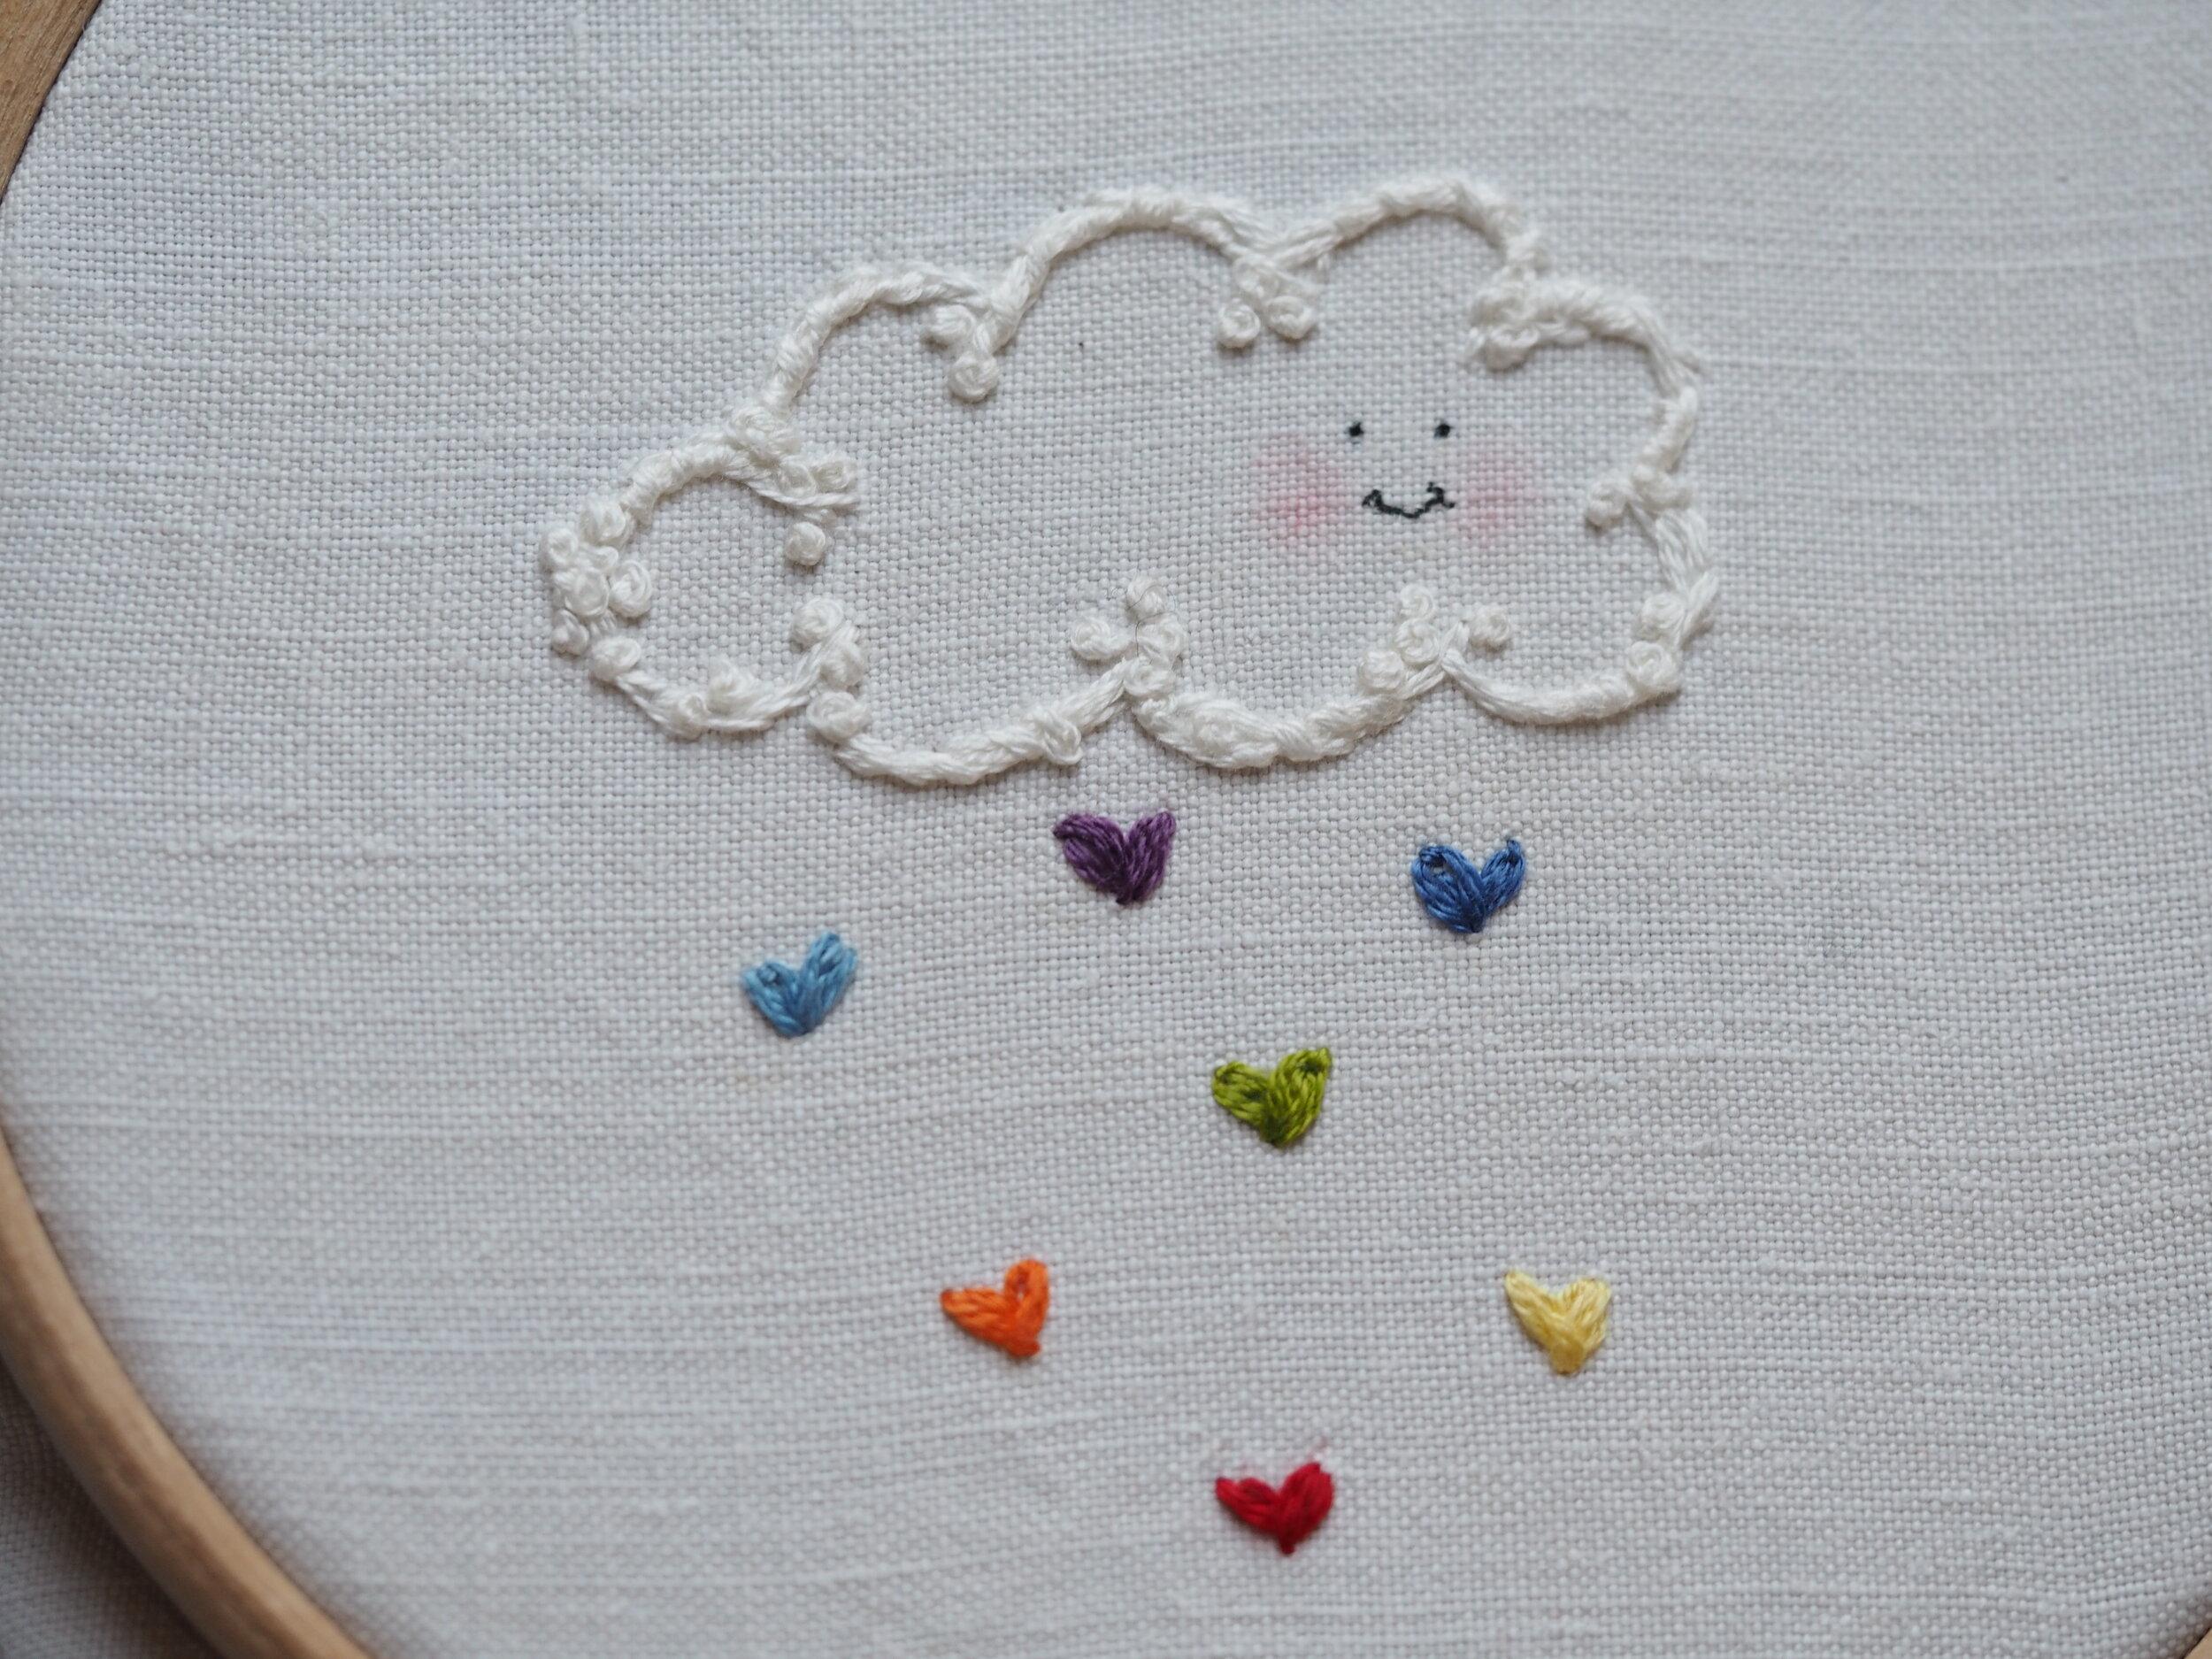 Cross Stitch Embroidery Needlework Fruit Basket Pattern Lovely Quality Decor Art